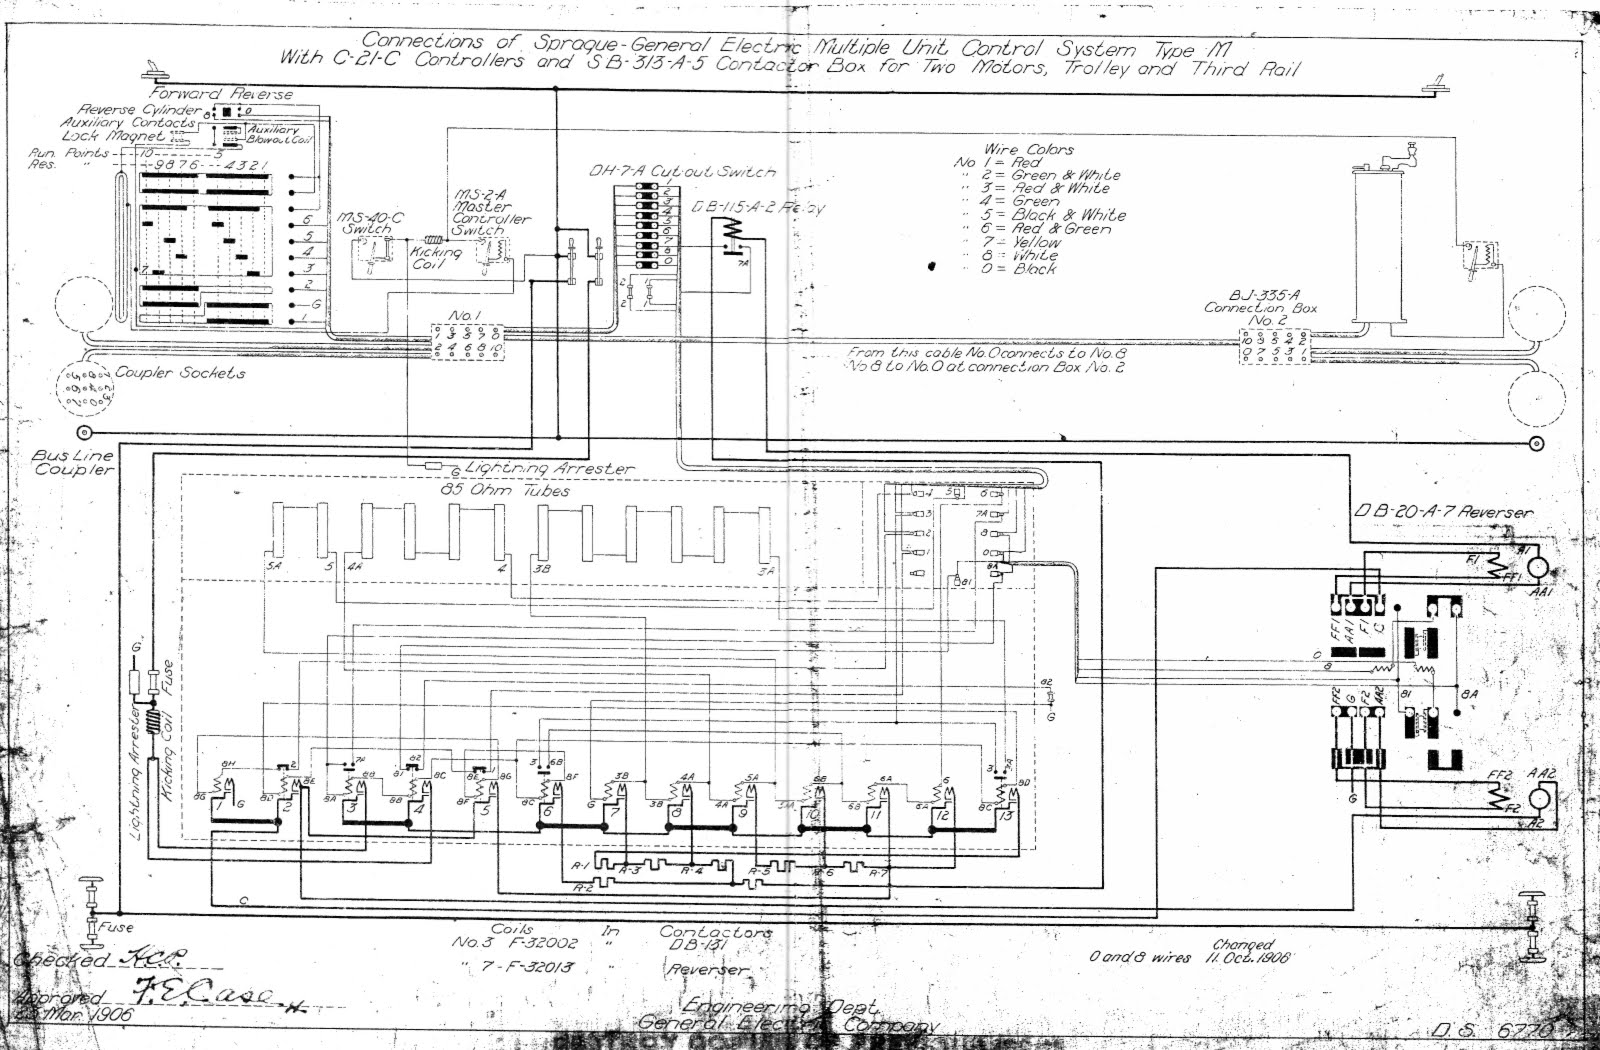 tata car manuals wiring diagrams pdf fault codes rh automotive manuals net wiring manual for leviton osfhu-i4w wiring manual for 1963 corvette